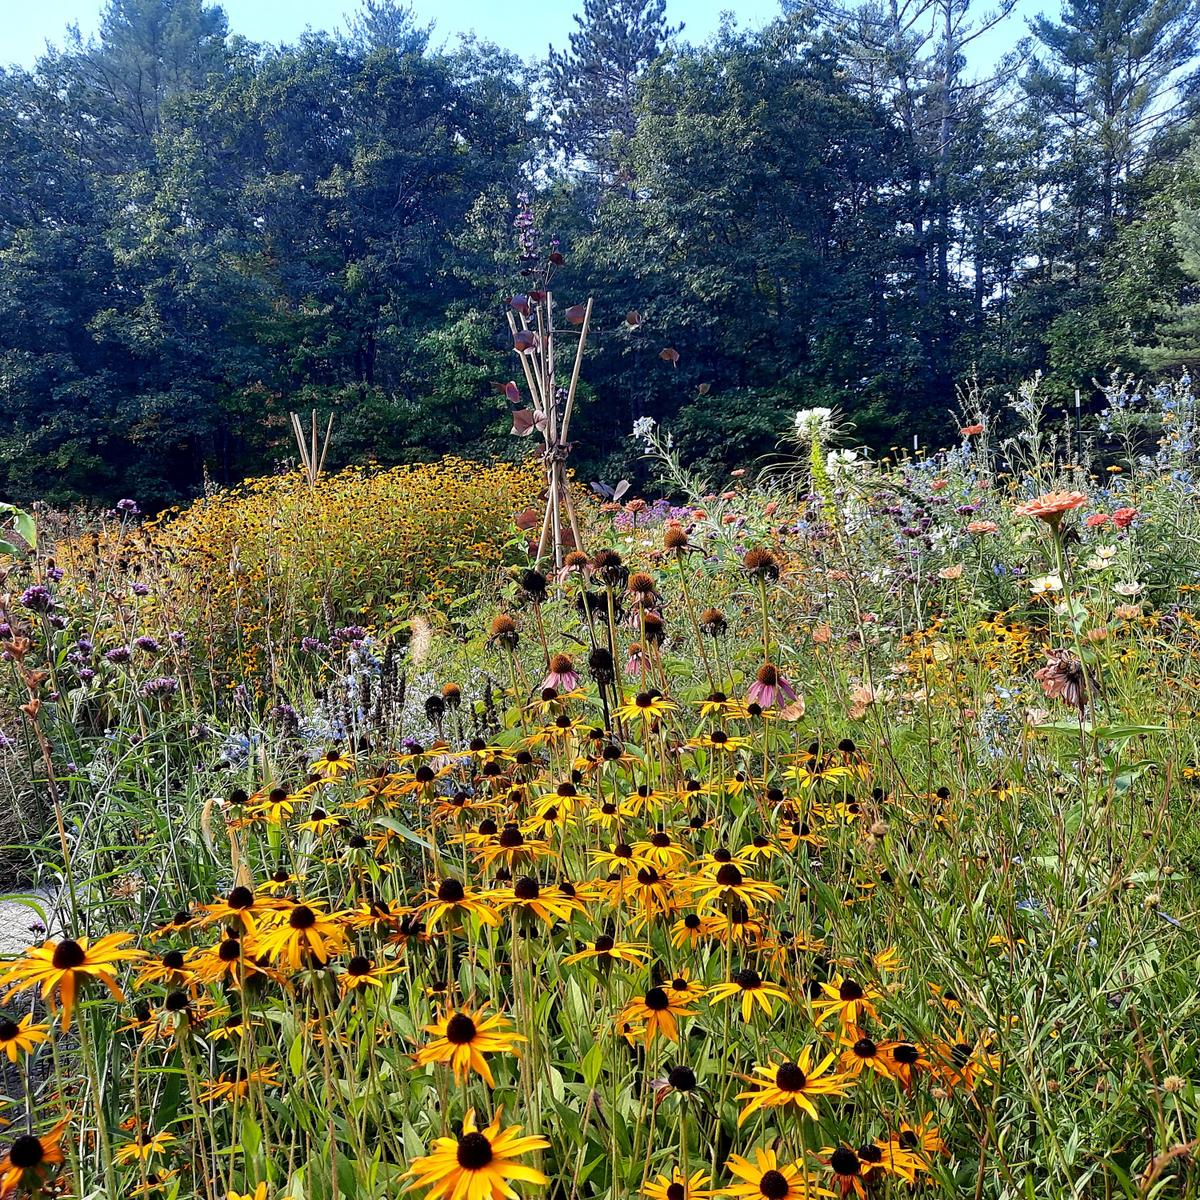 The pollinator garden at Valentine Farm. Photo credit: Enock Glidden